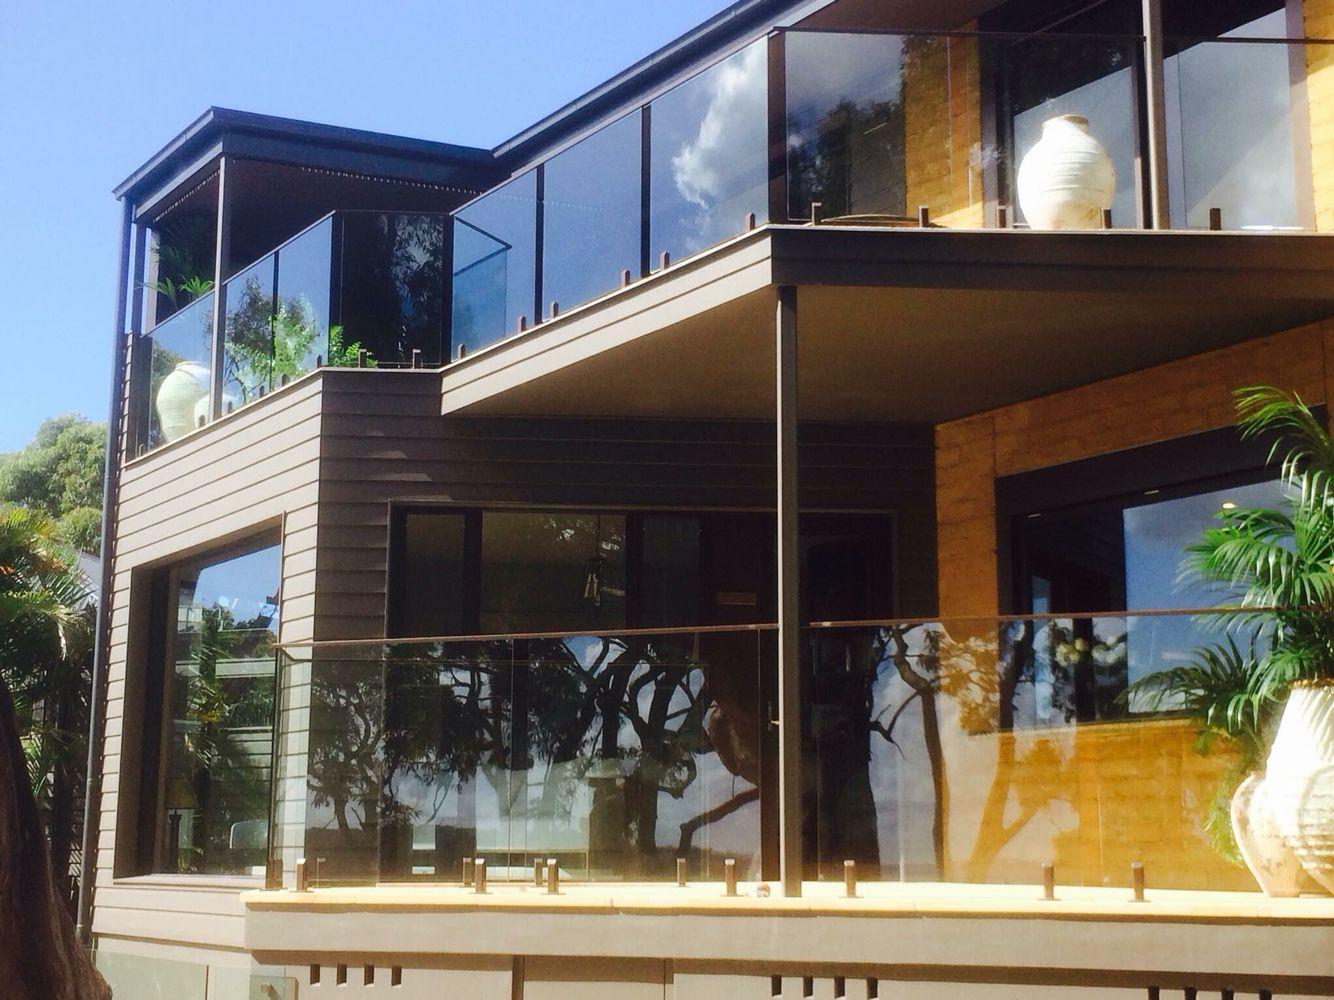 Altezza Dei Parapetti frameless glass balustrade with stainless steel spigots a